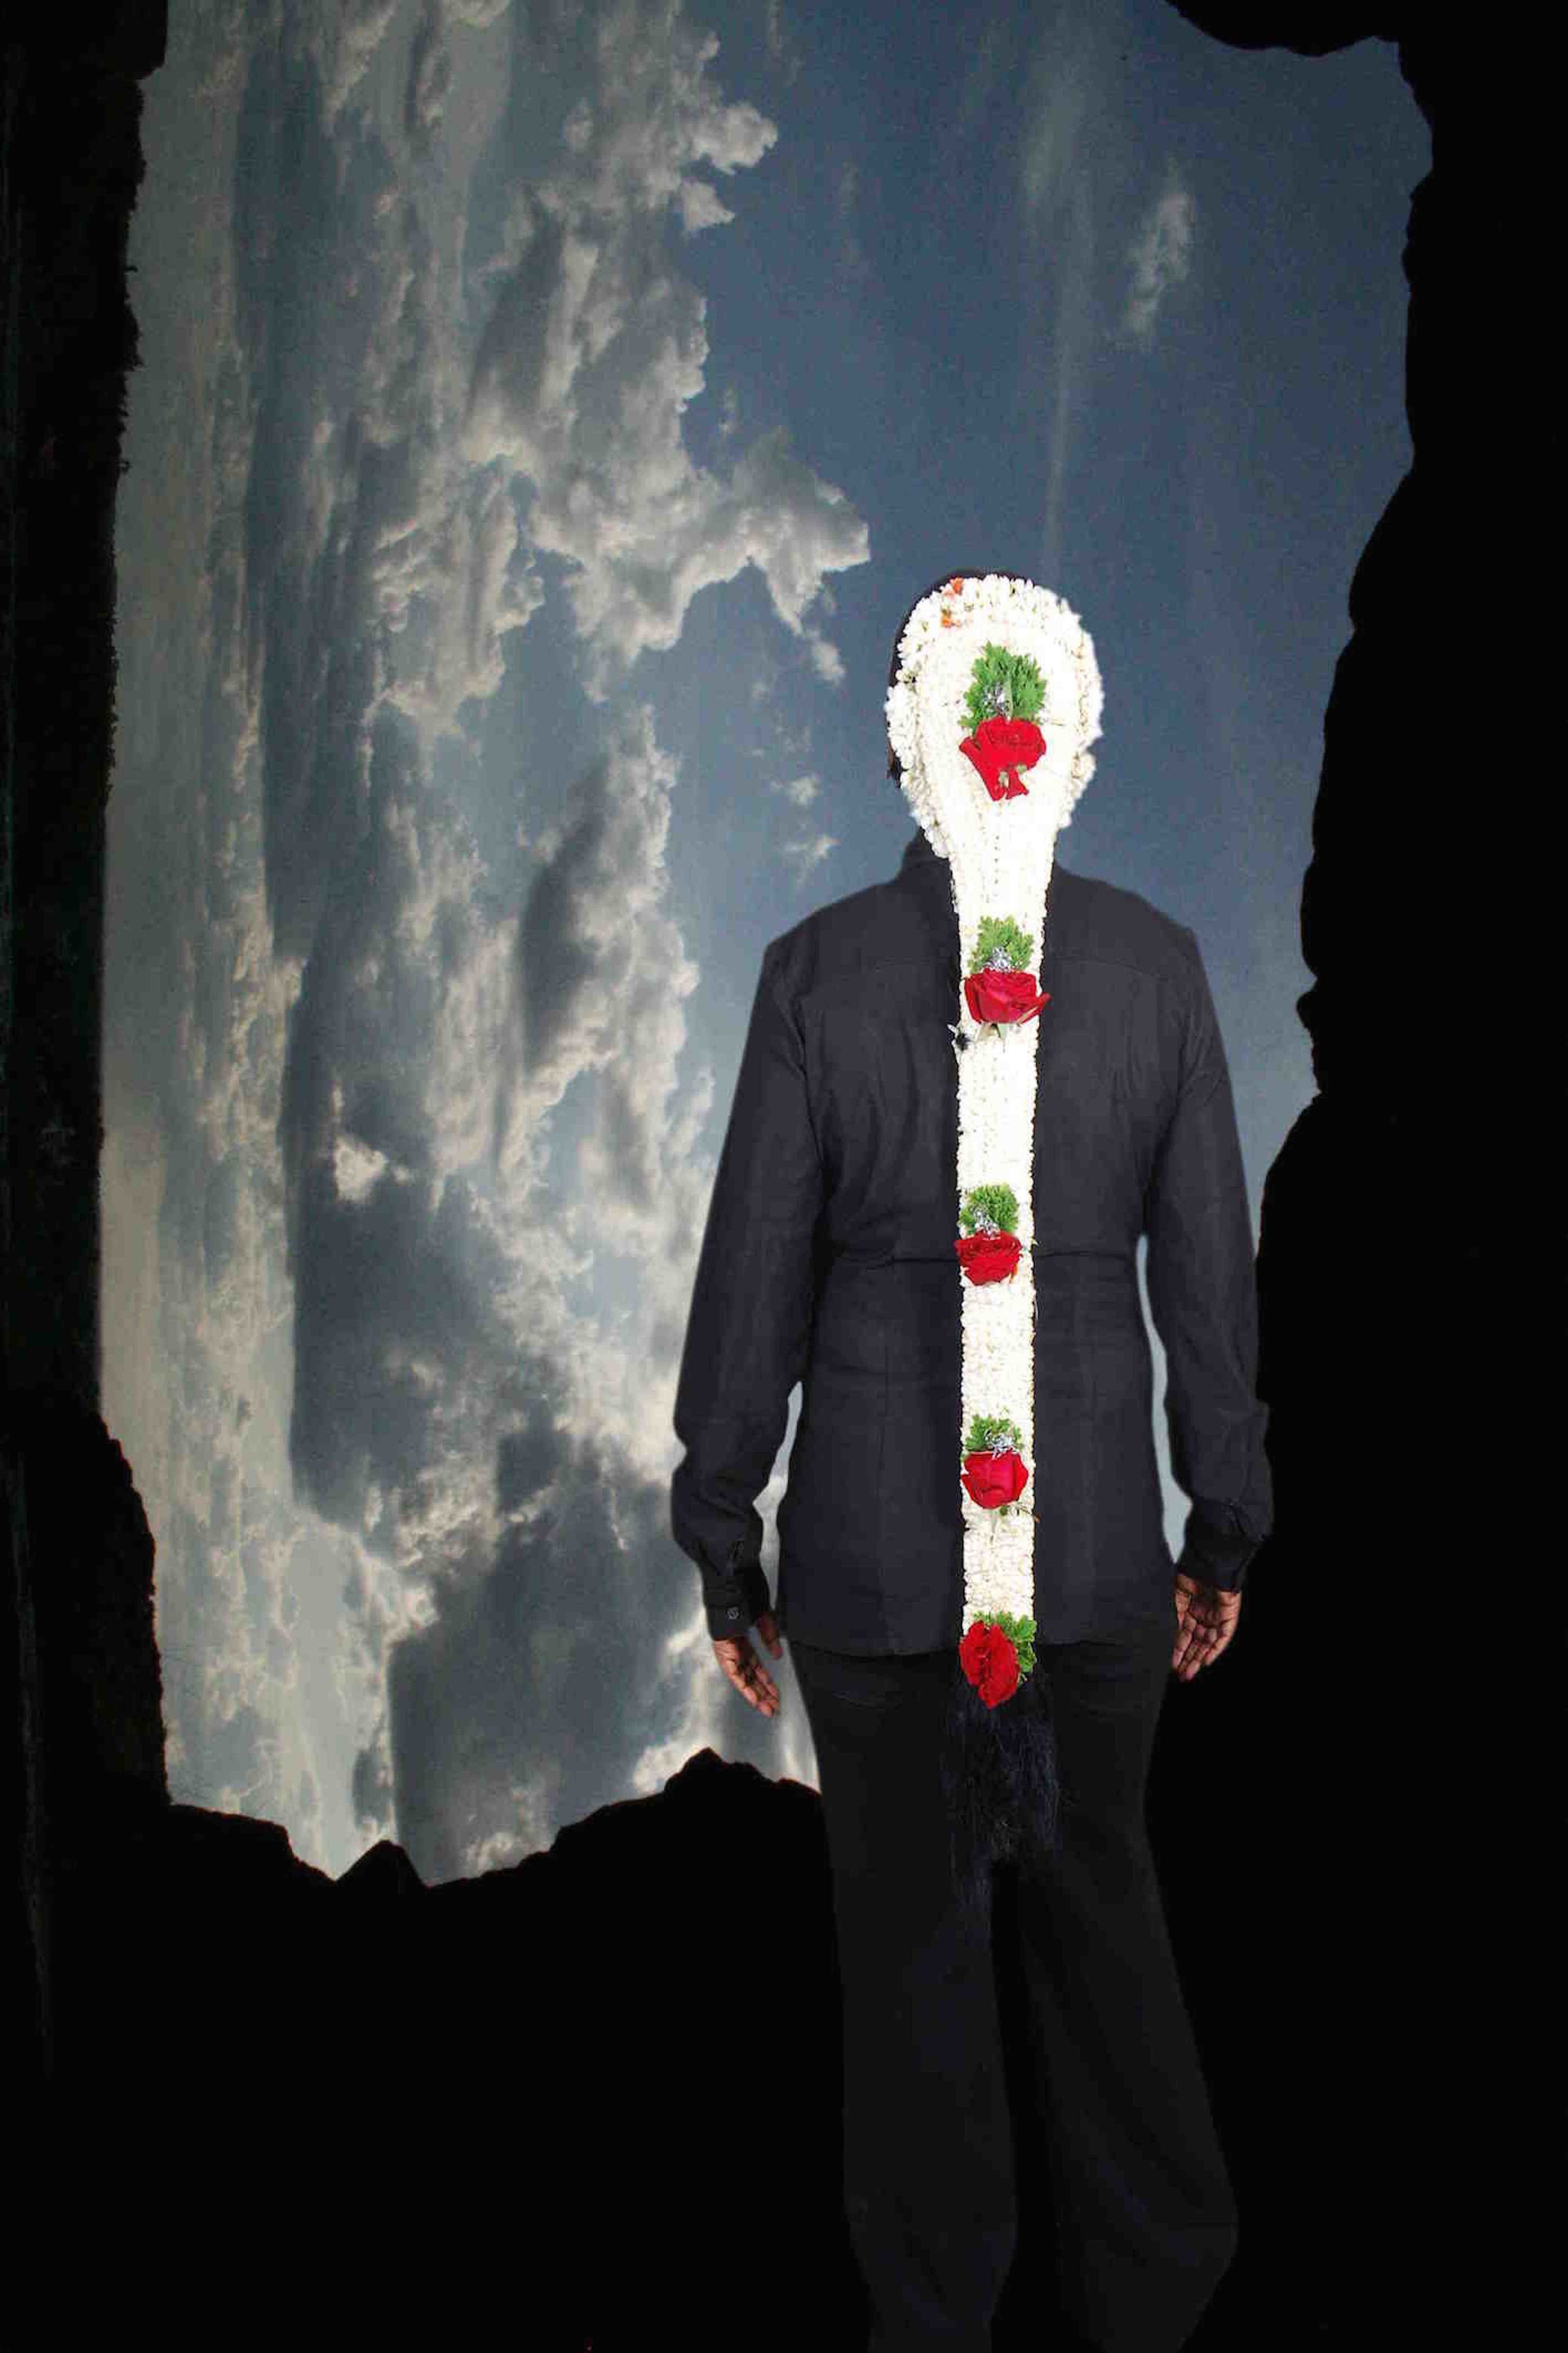 Surekha, Beyond Reflections, 2010